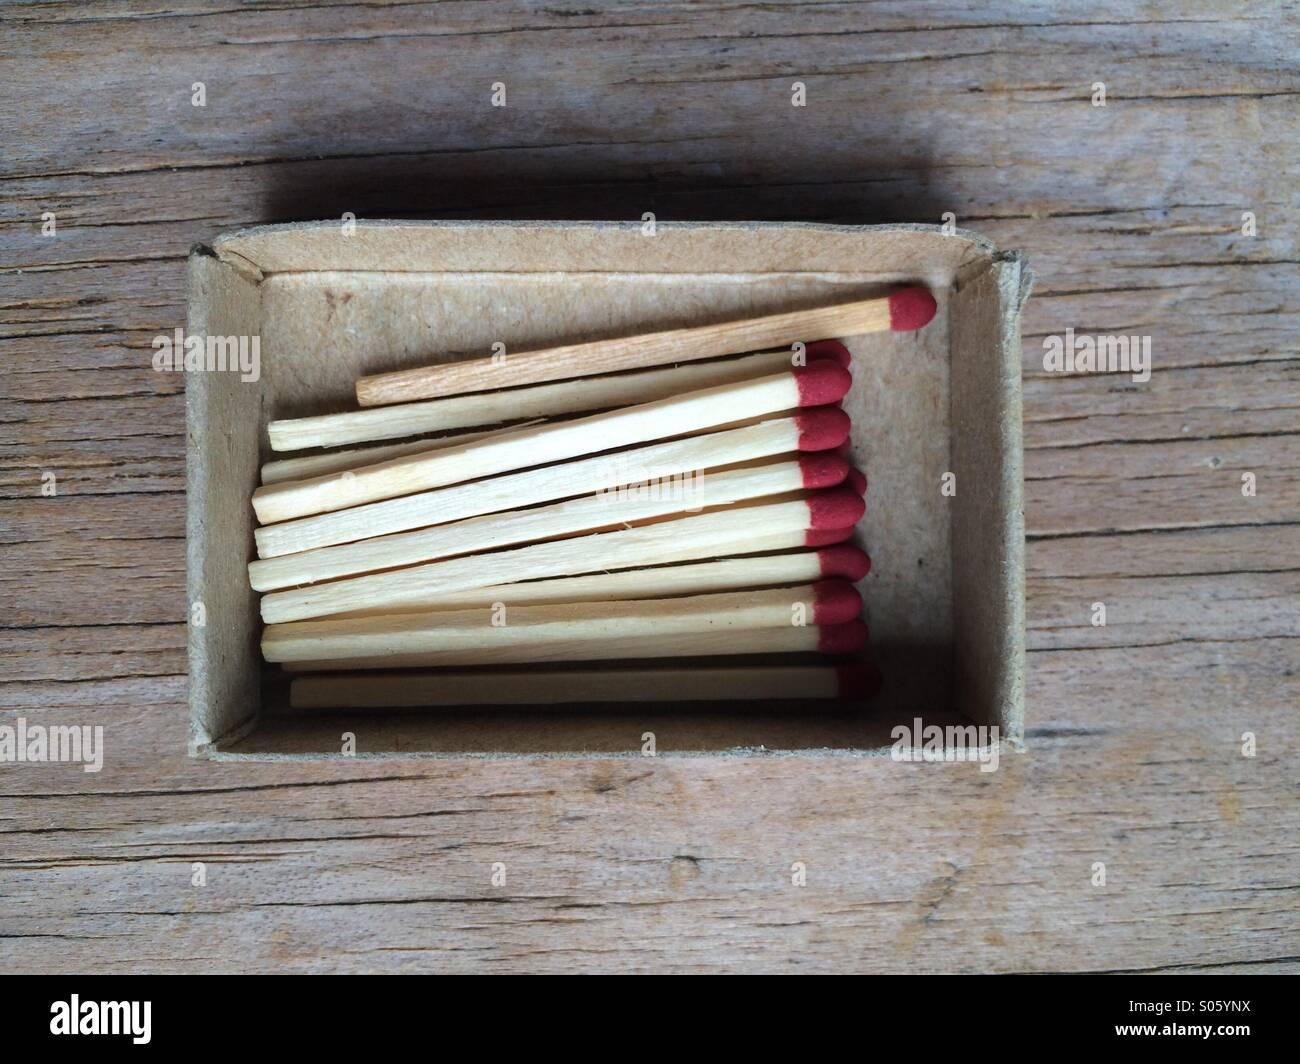 Matches - Stock Image